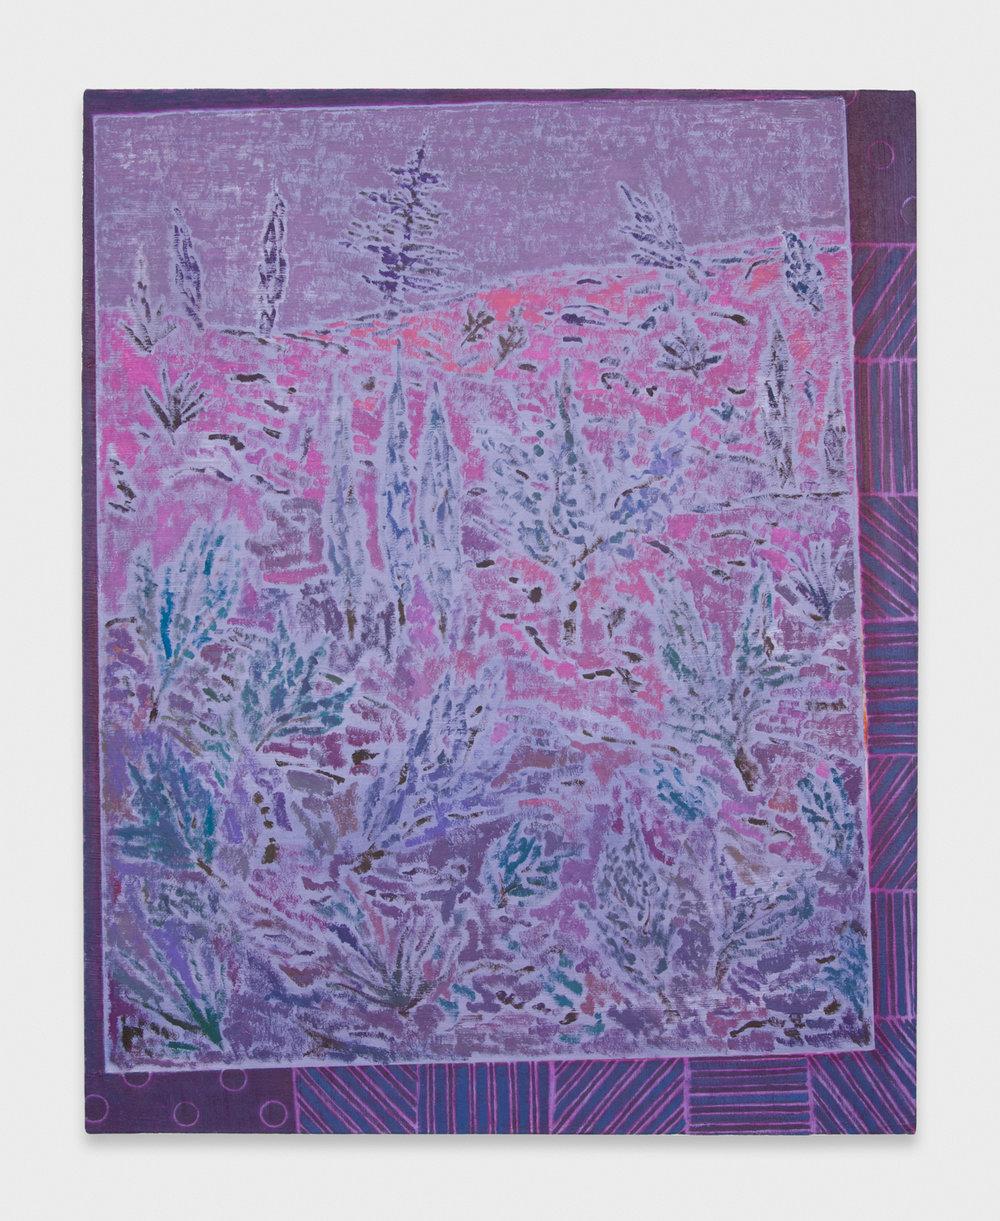 John McAllister  Rustling Clatter-Calm  2012 Oil on canvas 31h x 25w in JMC007